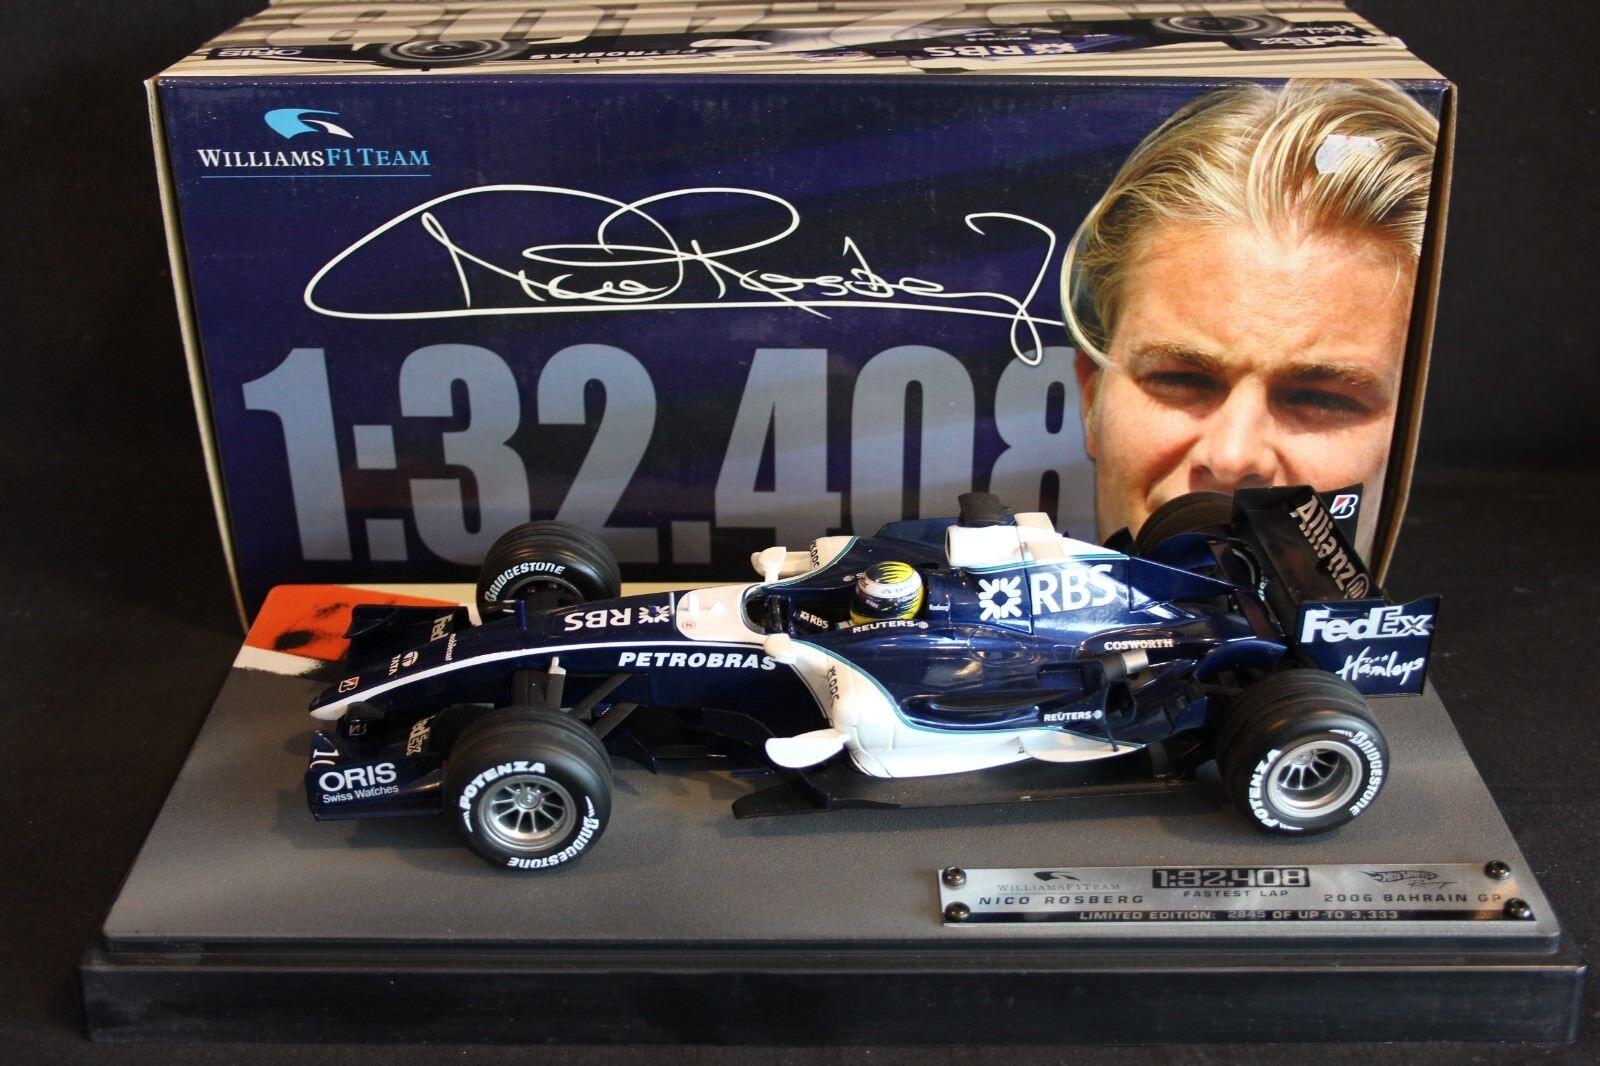 Hot Wheels Williams Cosworth FW28 06 1 18 Nico Rosberg Fastest Lap 1.32.408